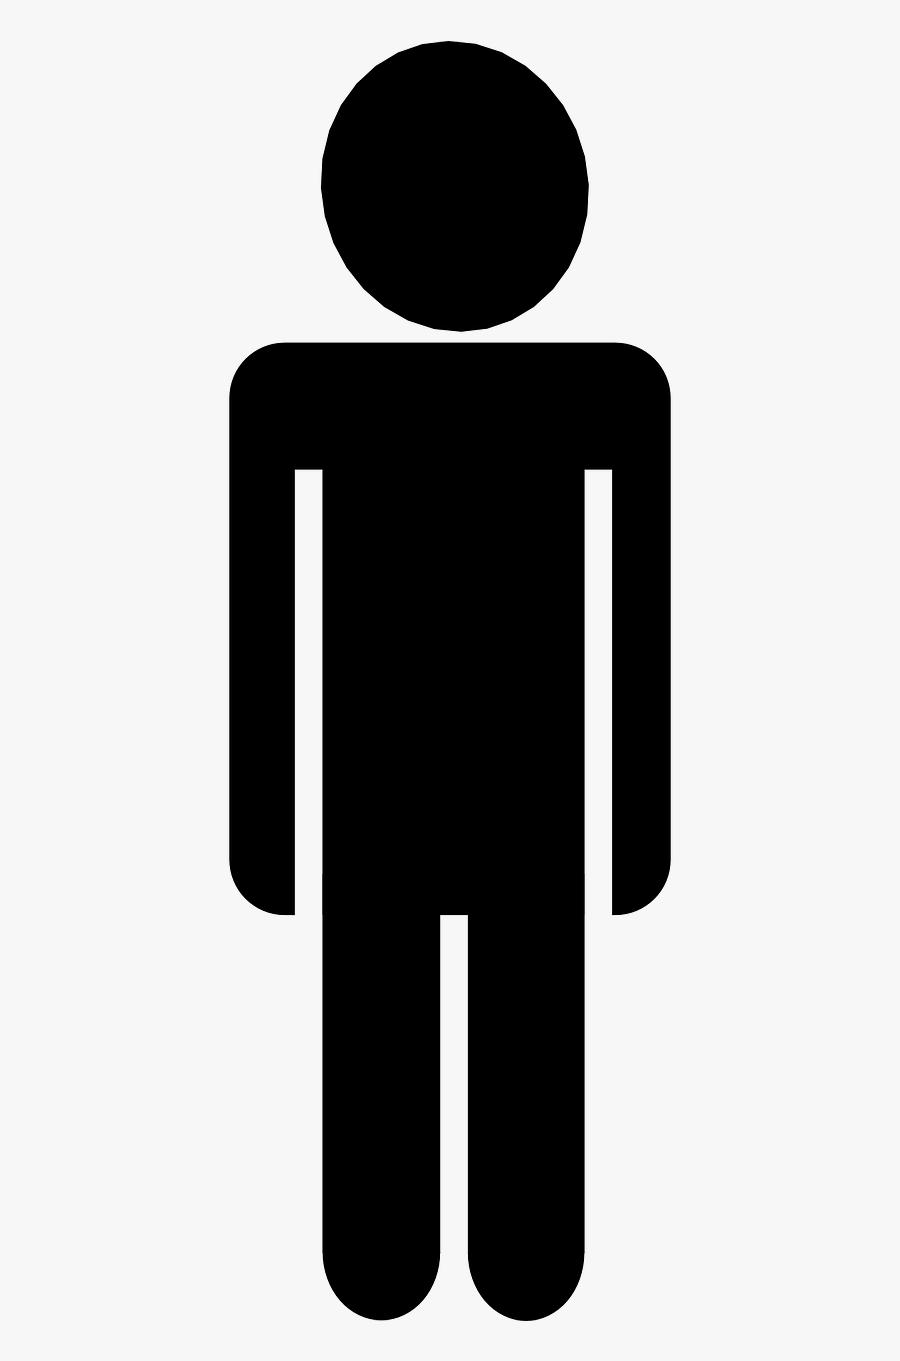 Man Male Silhouette.